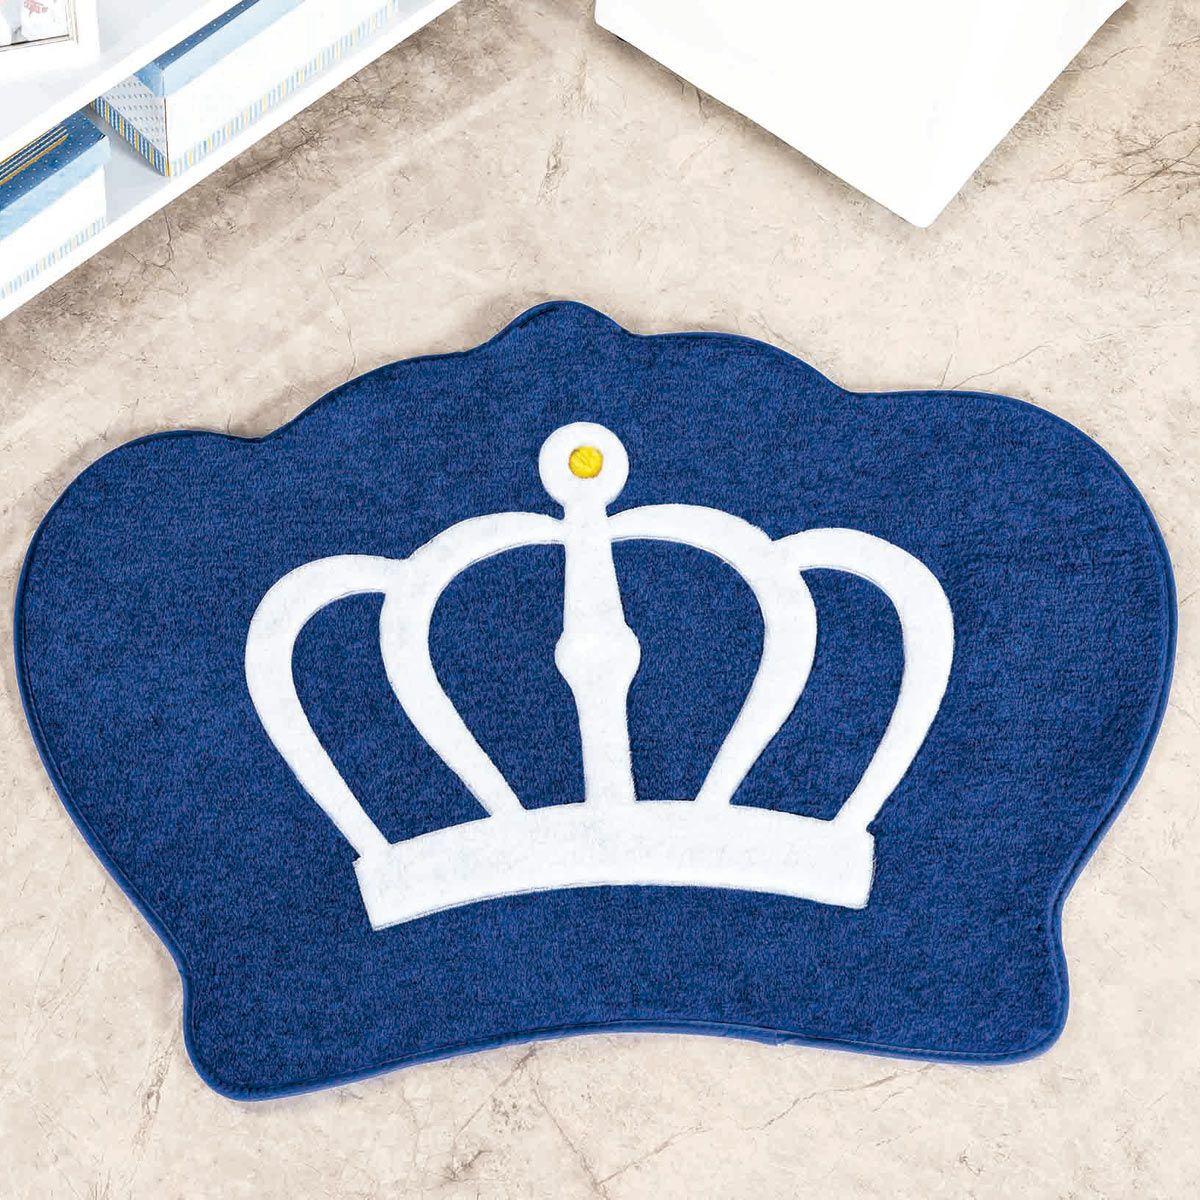 Tapete Infantil Premium Formato Coroa Azul Royal 86cm x 64cm